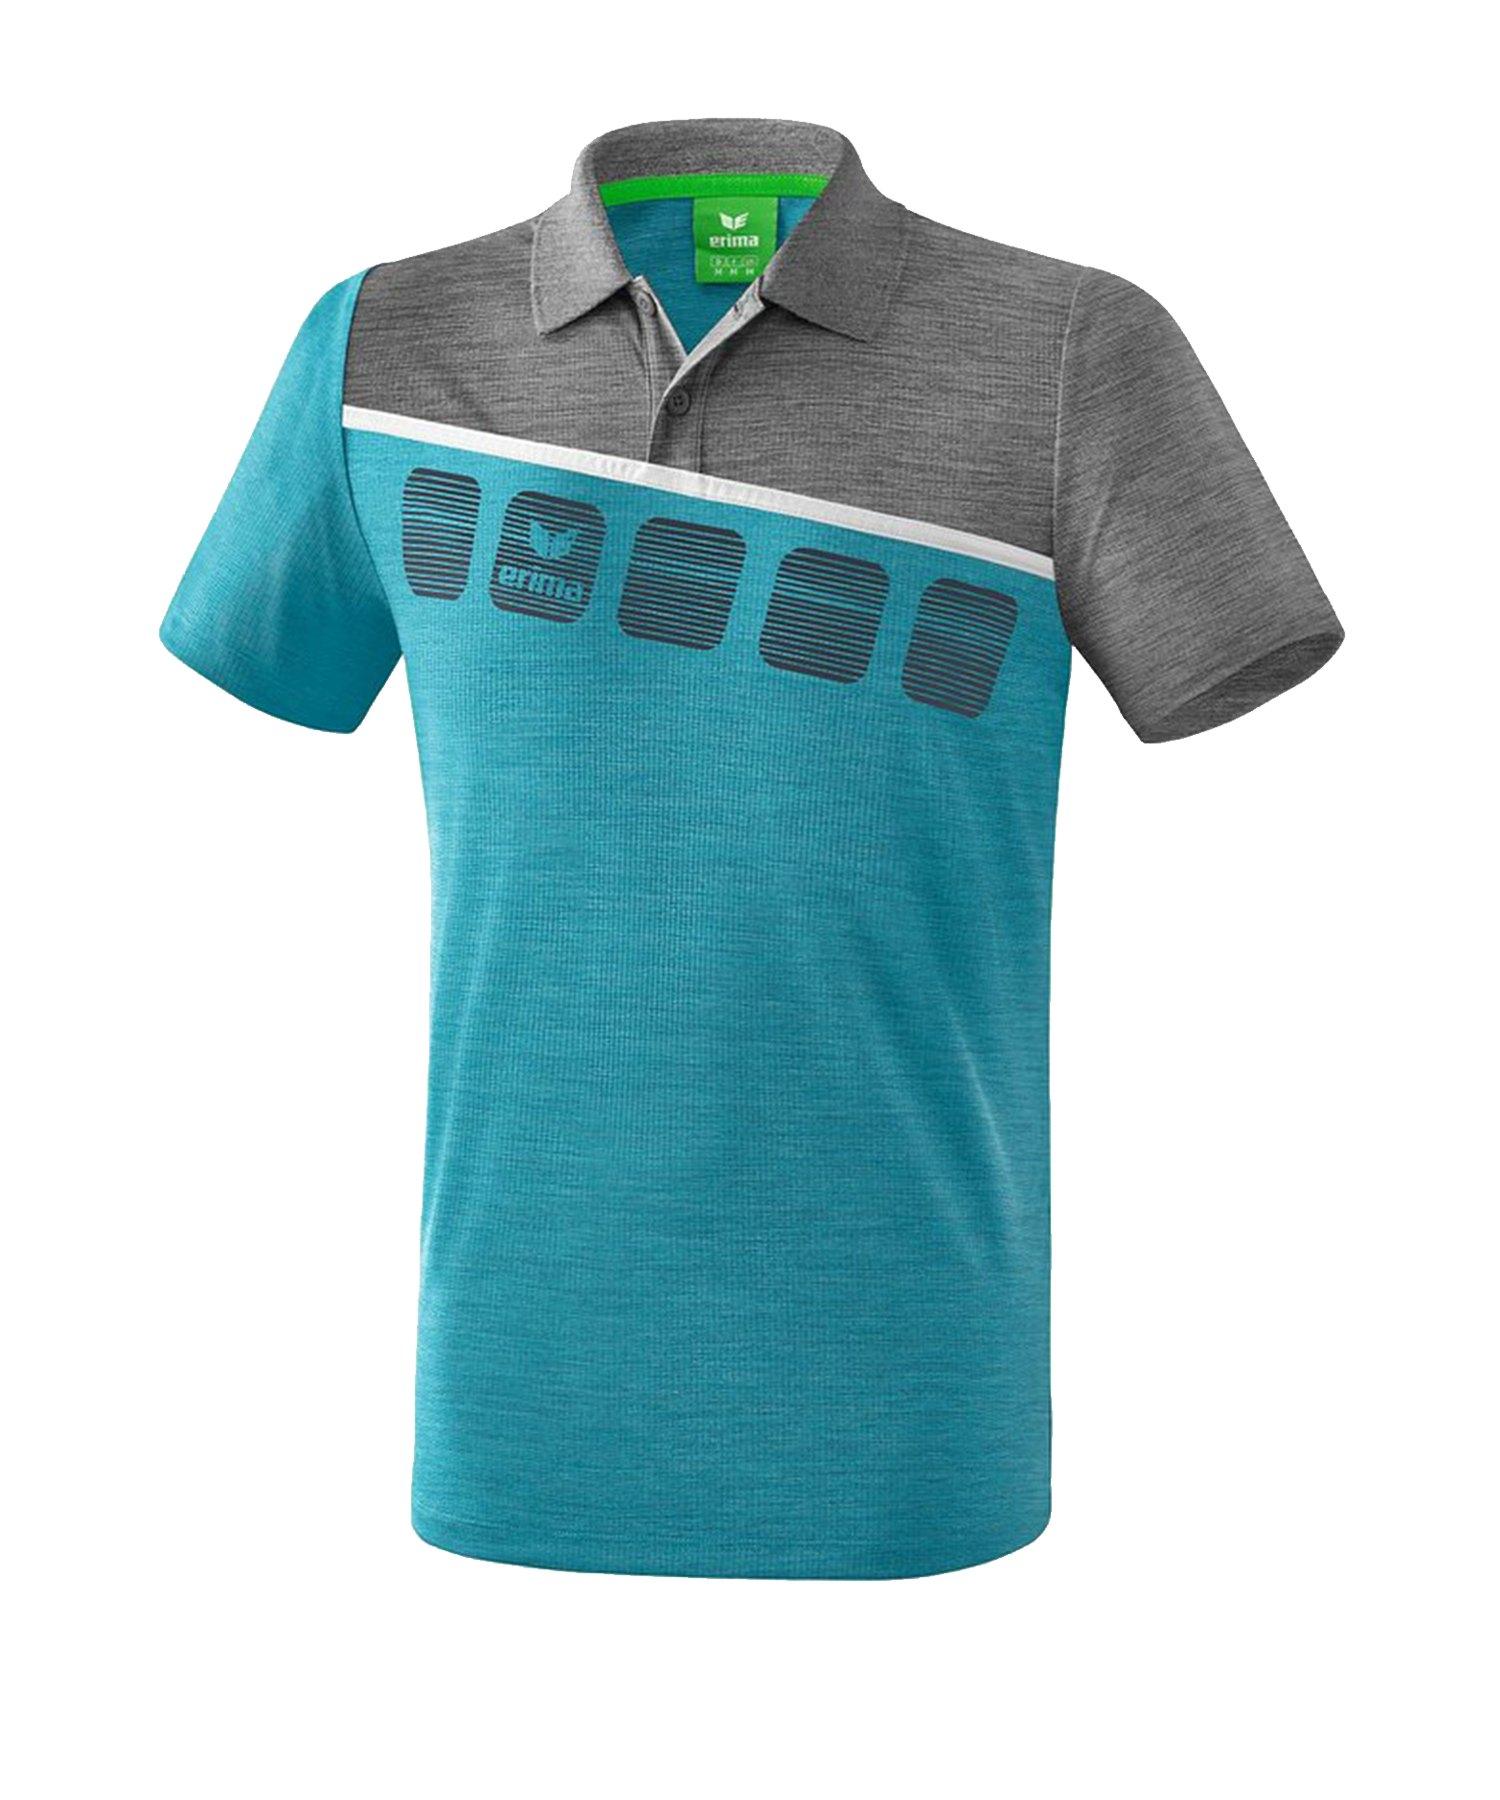 Erima 5-C Poloshirt Kids Blau Grau - Blau